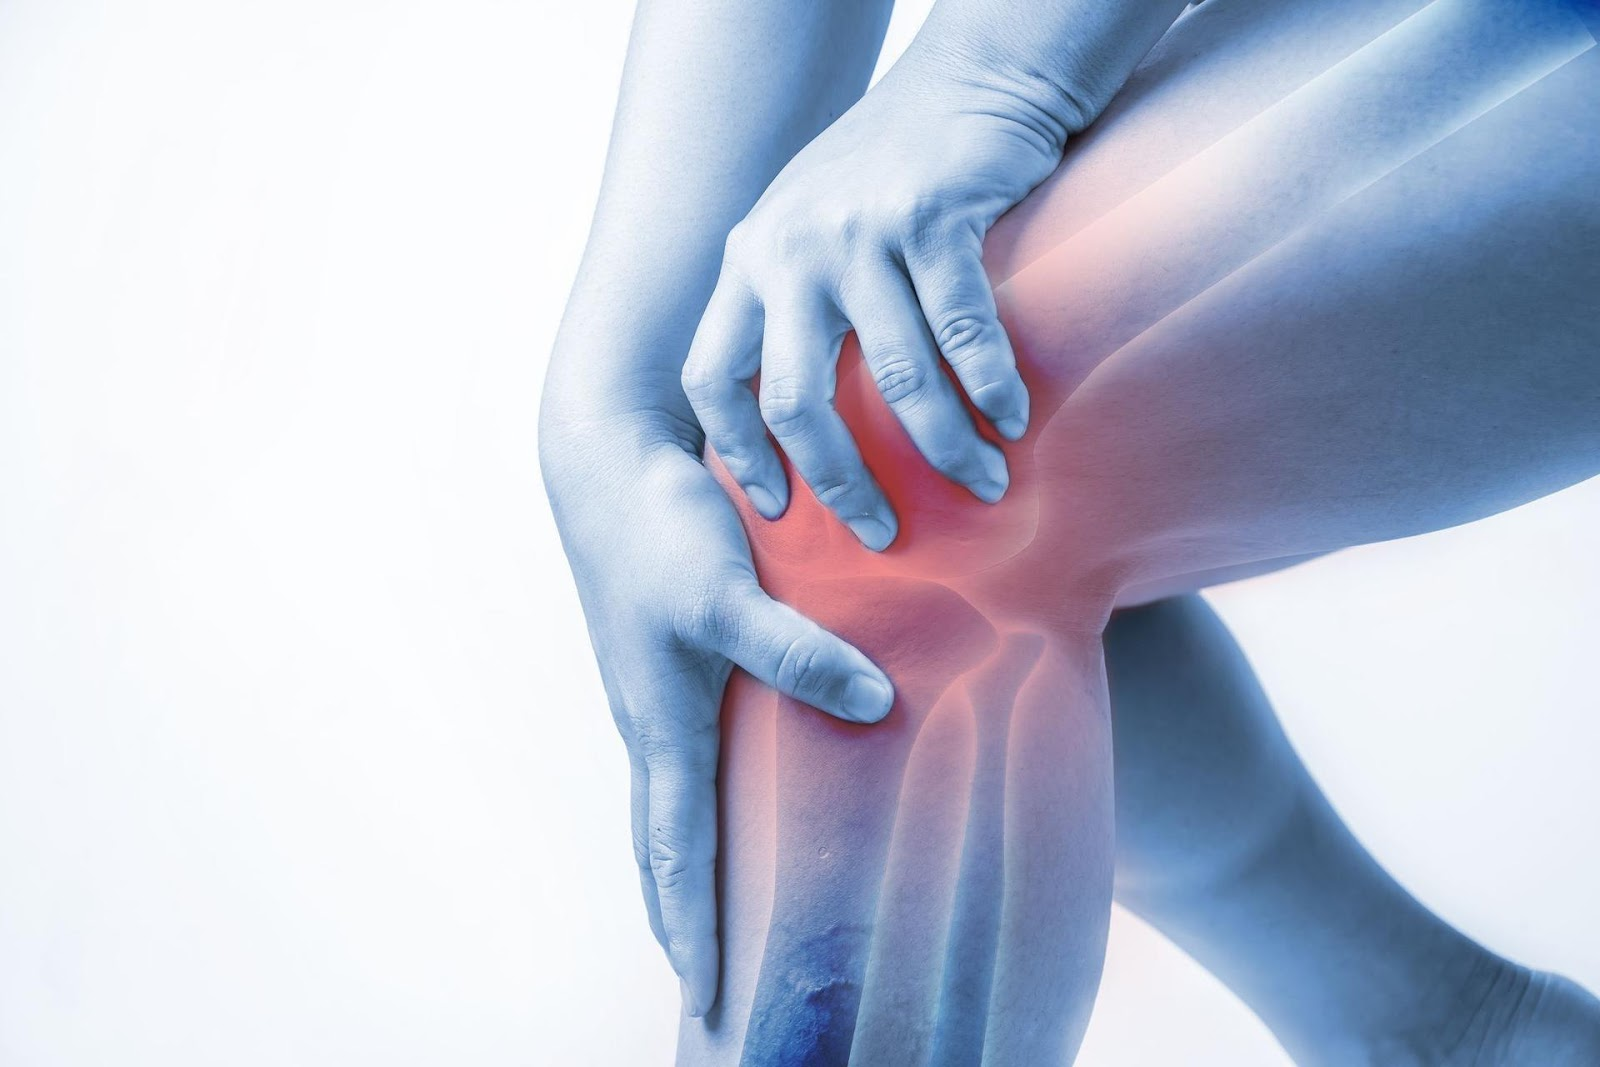 Znalezione obrazy dla zapytania bolące kolano